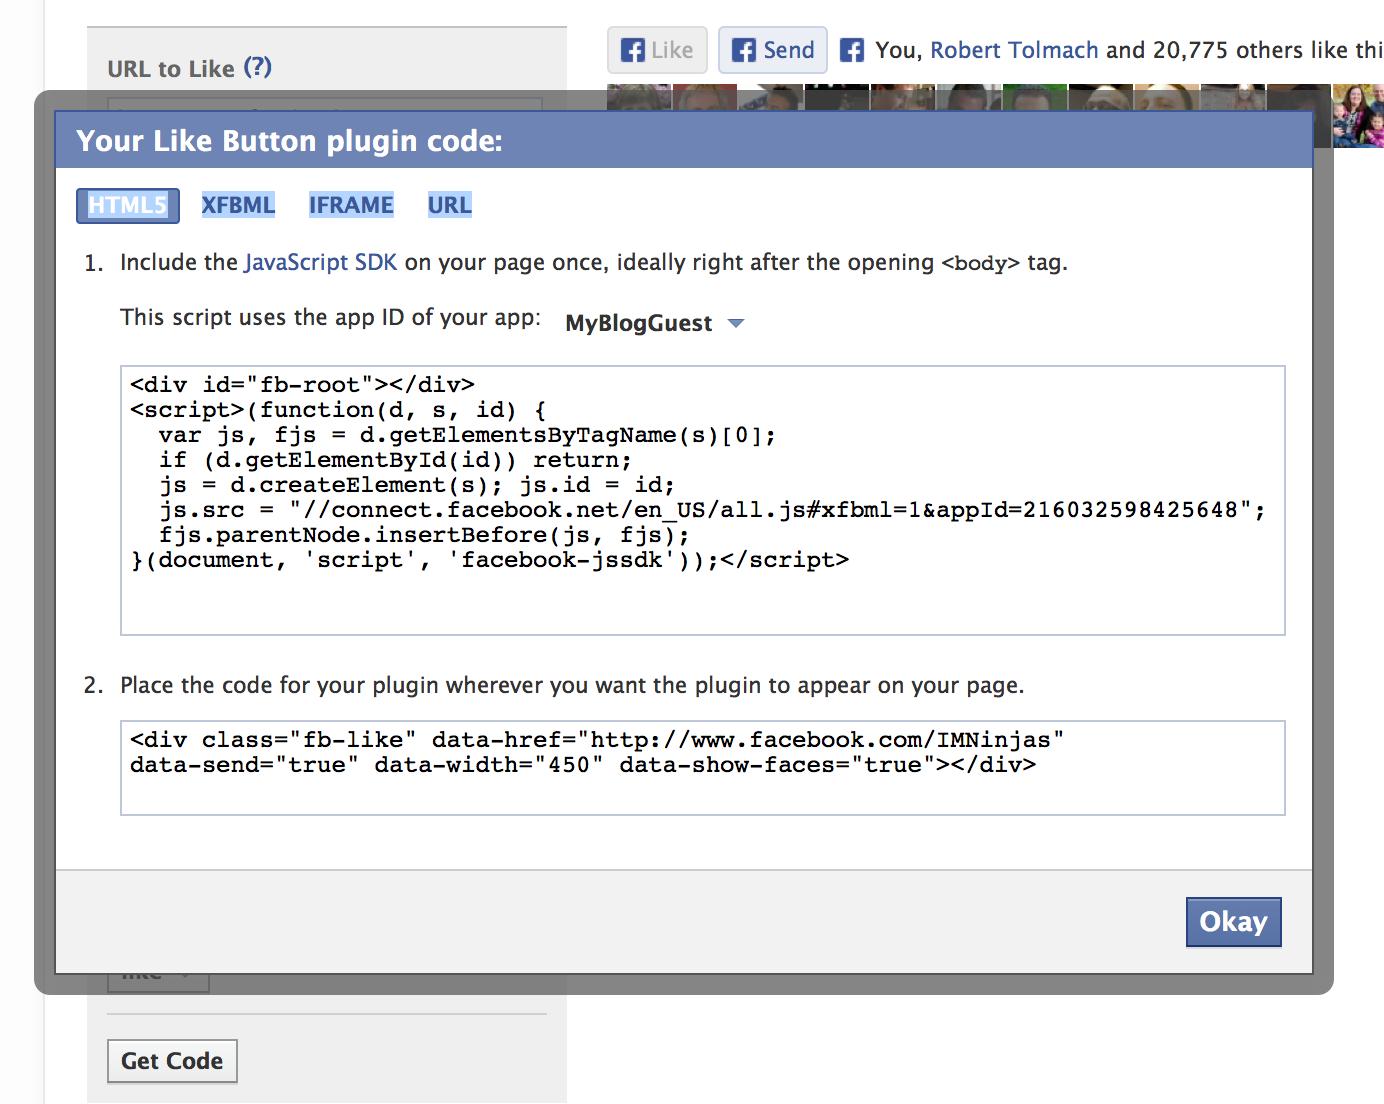 Optimizing Your Facebook Likes